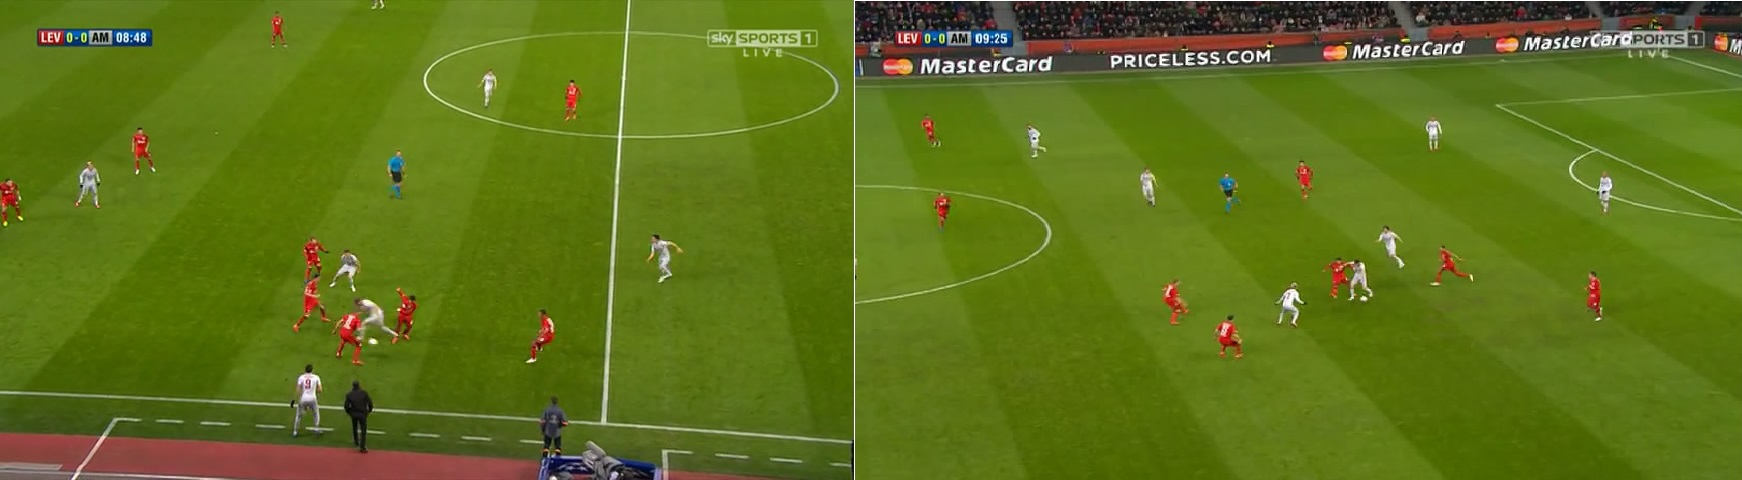 Cara Leverkusen menekan Atletico. Lihat bagaimana tiga hingga empat pemain menekan sekaligus yang membuat tertutupnya ruang untuk umpan.